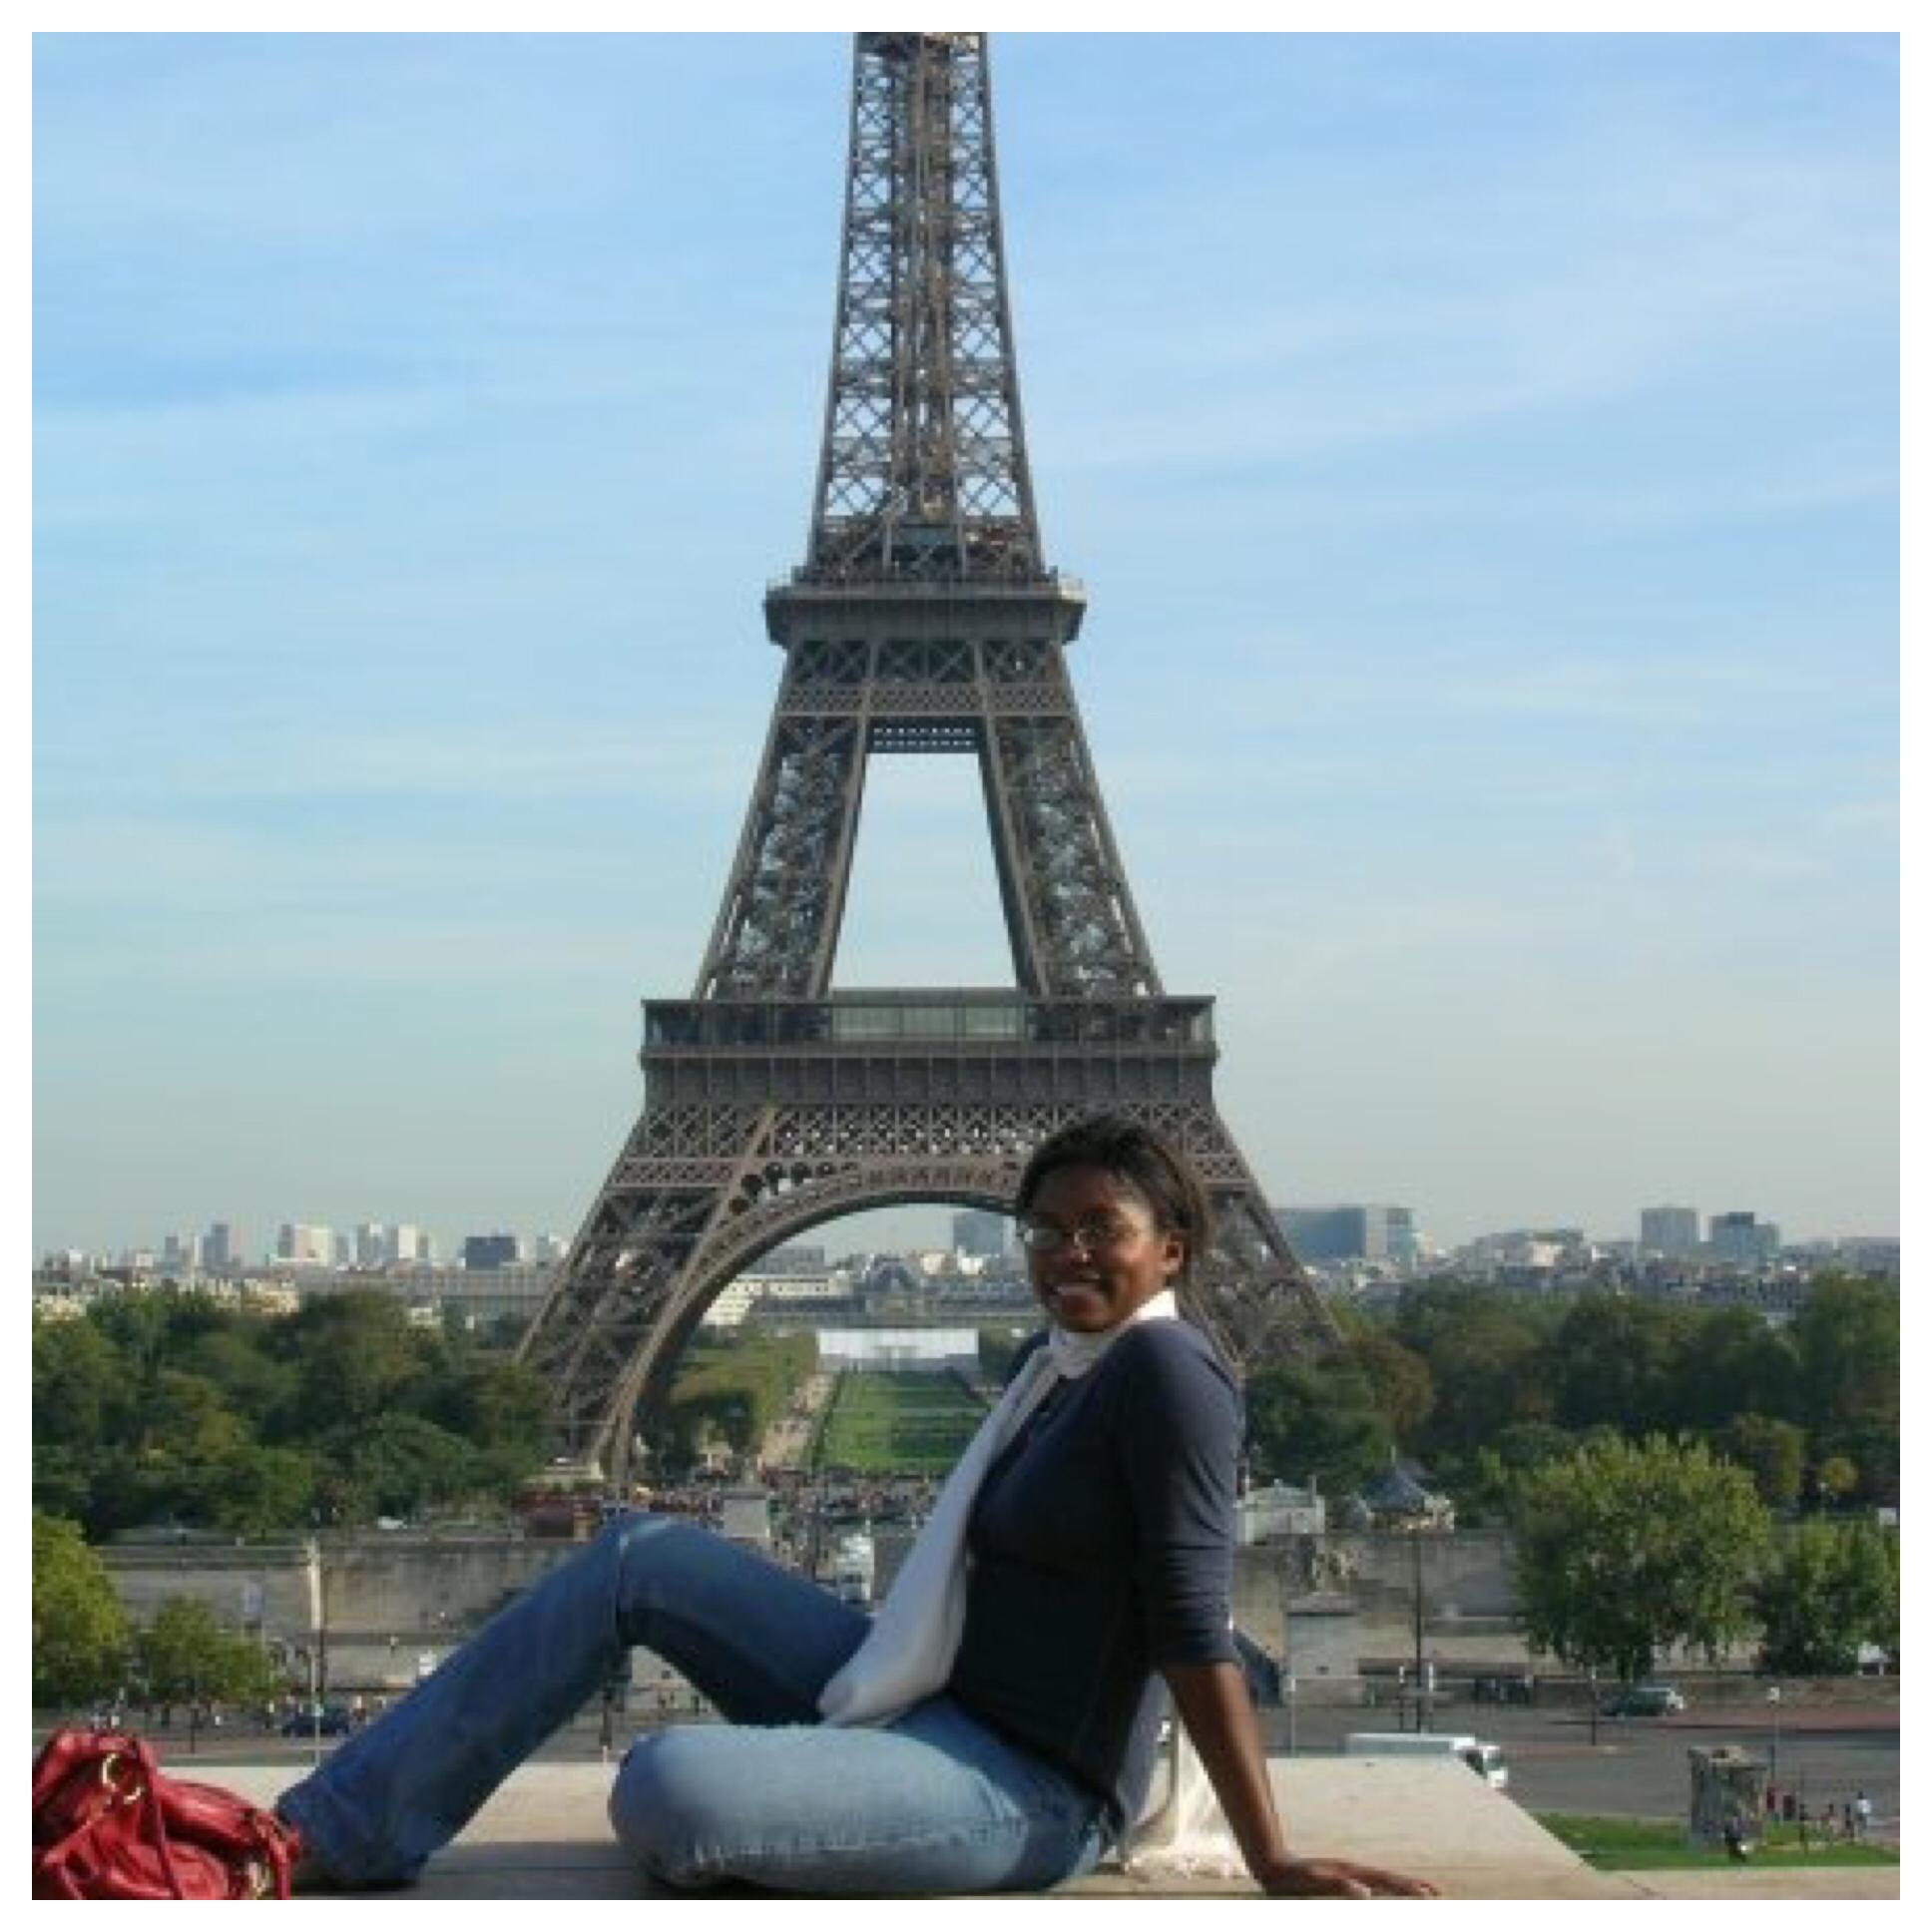 Celebrating my 19th birthday in Paris